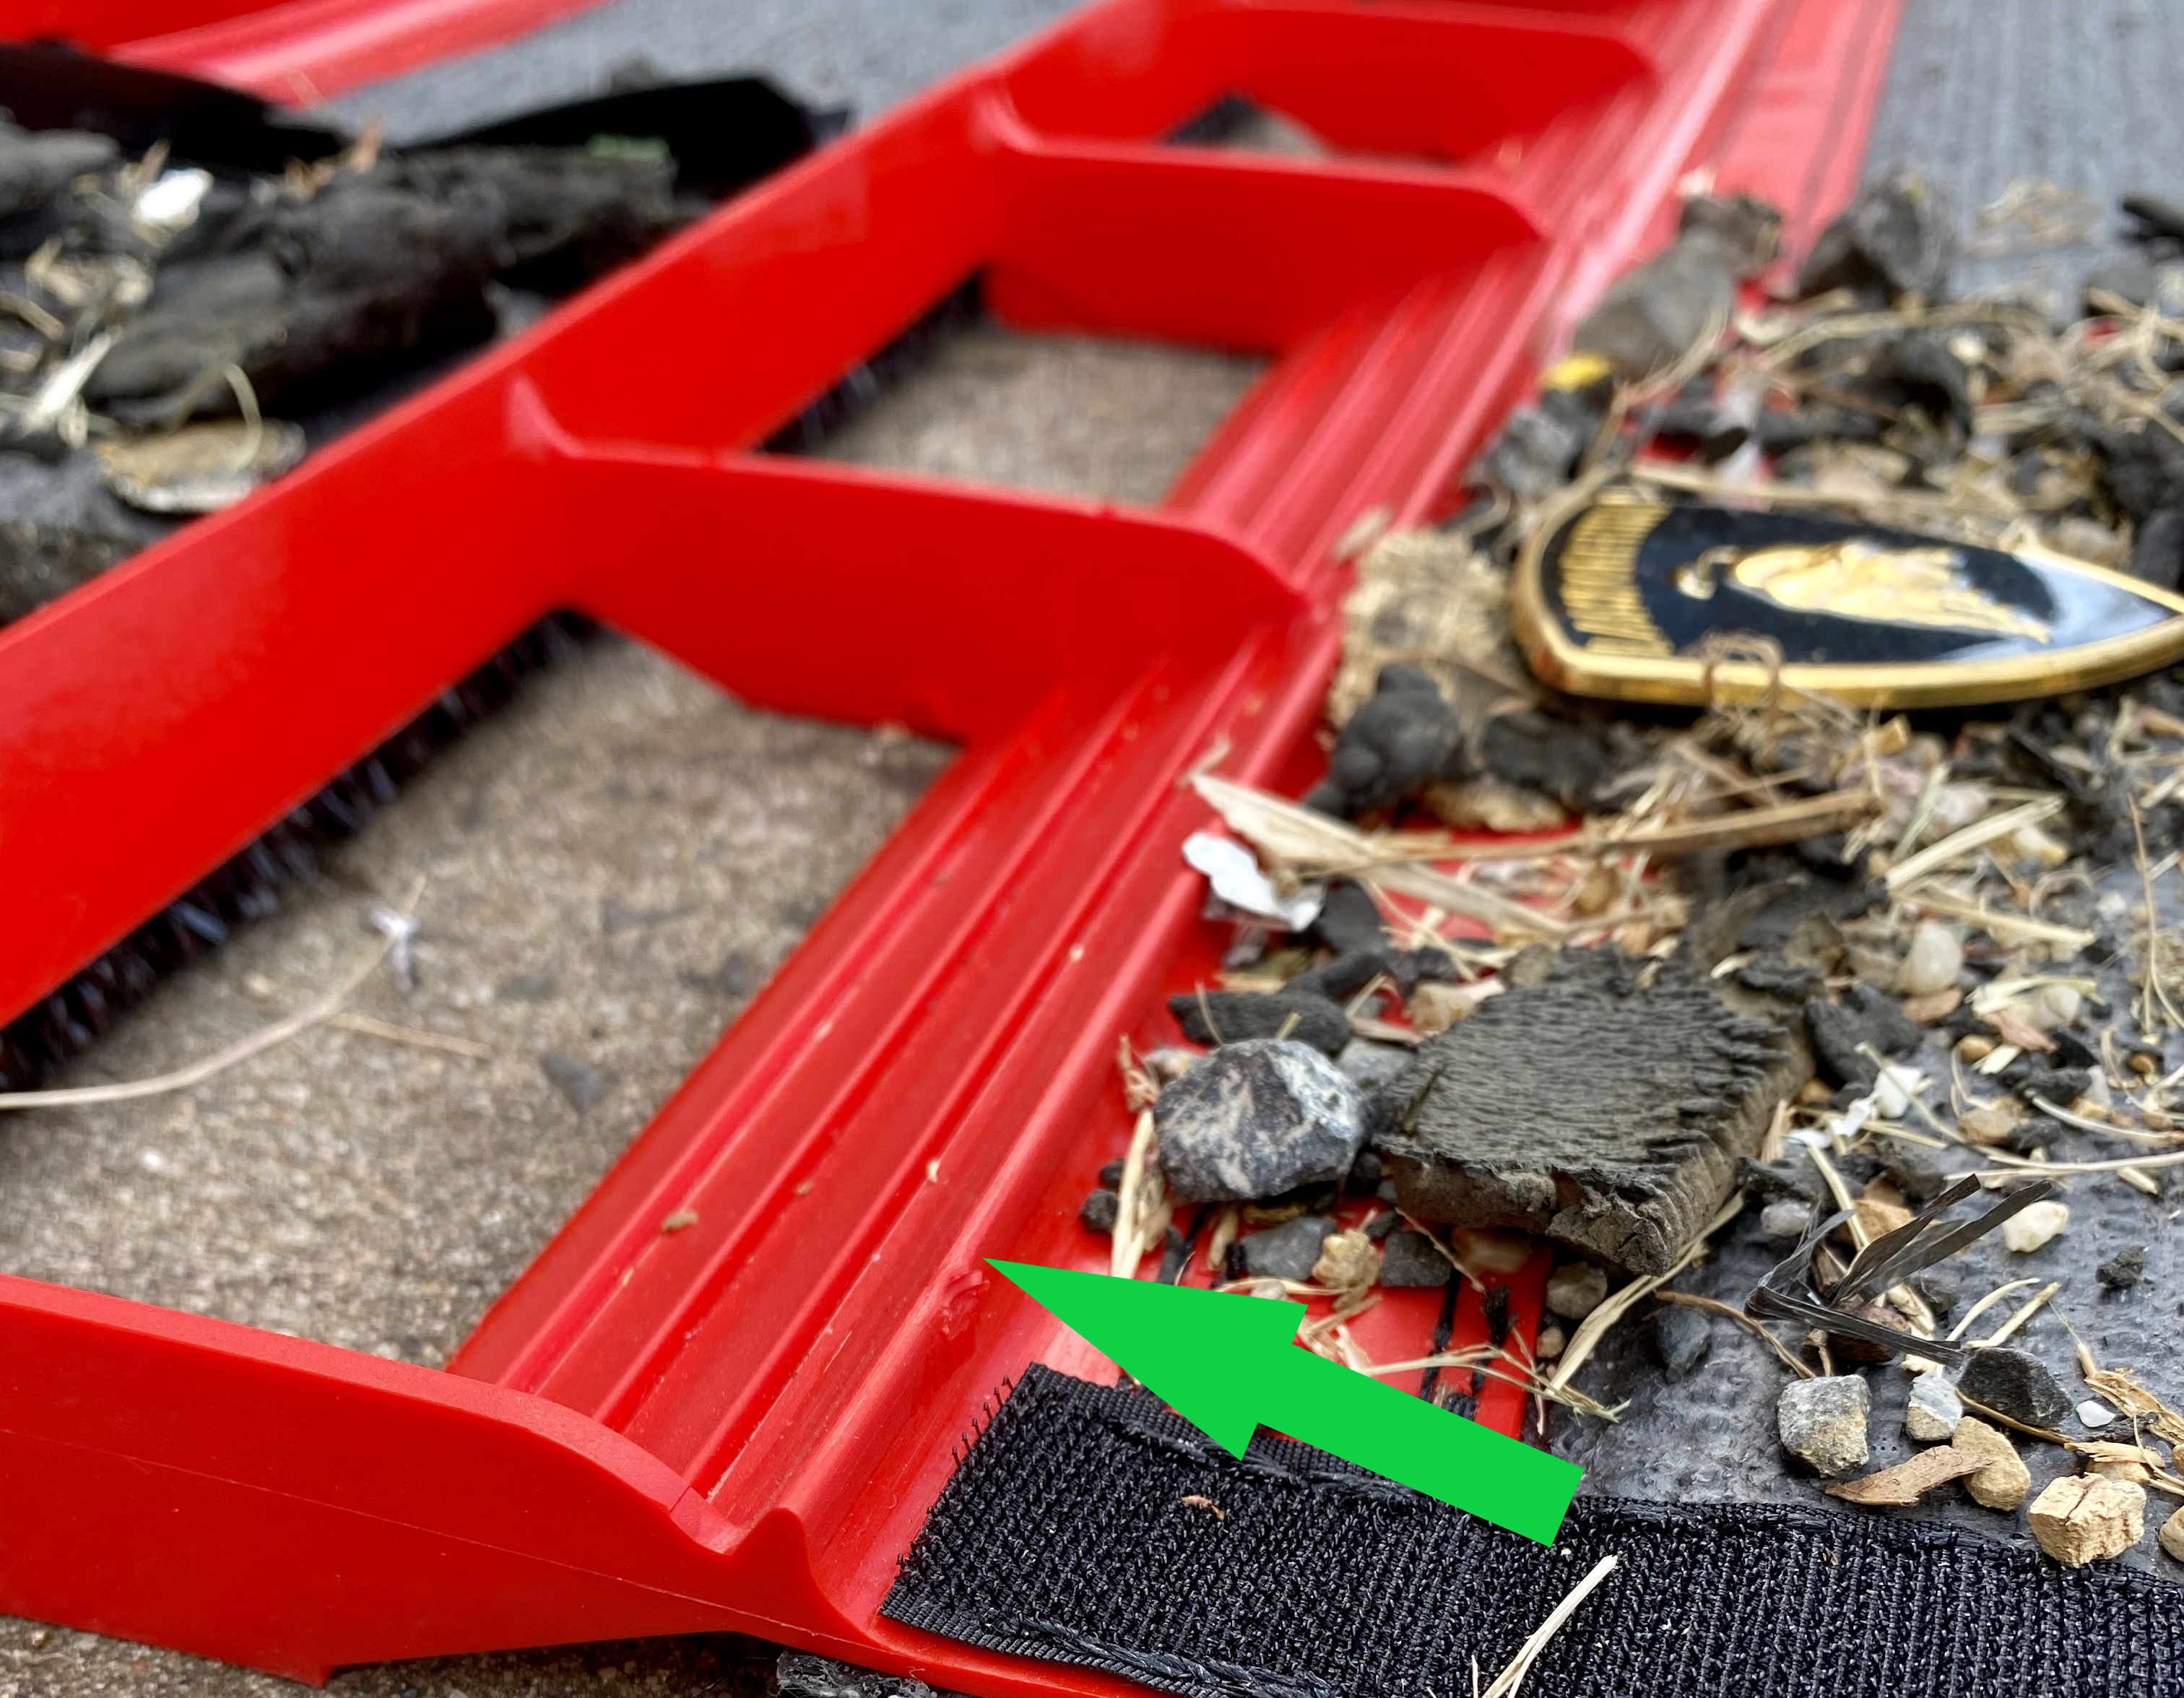 Debris Rentention Barrier With Arrow